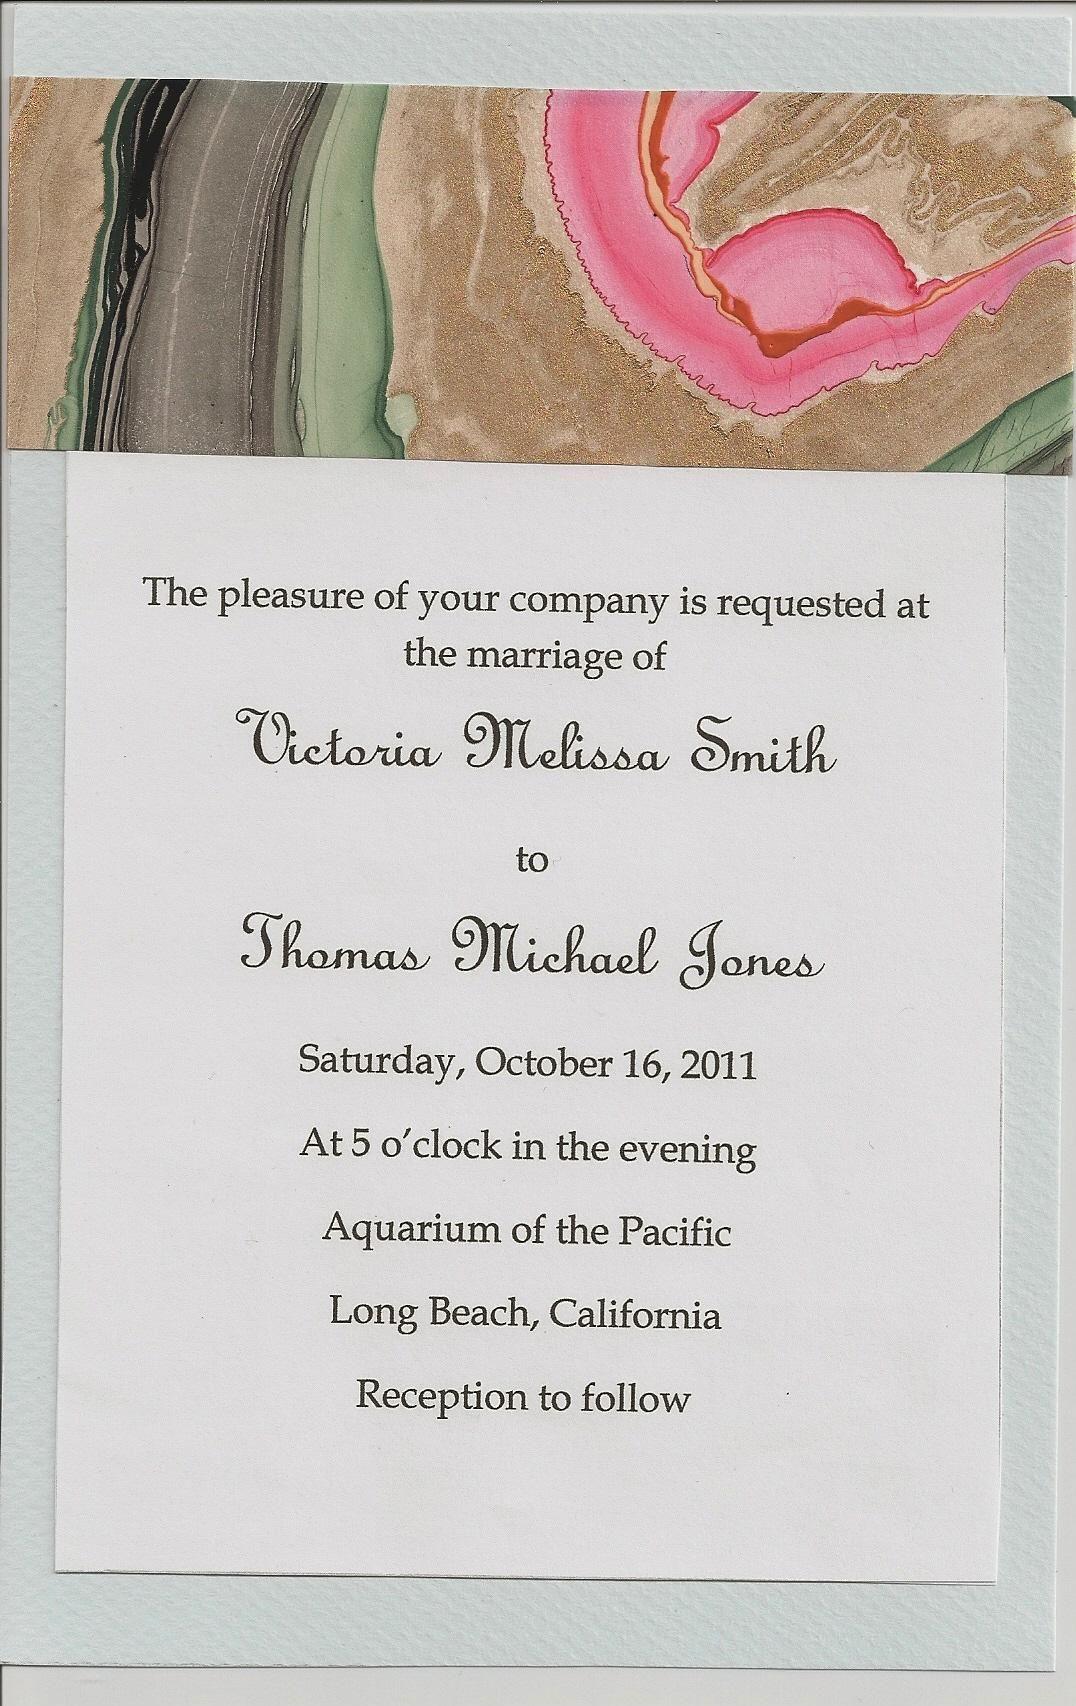 Diy wedding invitations simple wedding invitations using microsoft diy wedding invitations simple wedding invitations using microsoft word solutioingenieria Images